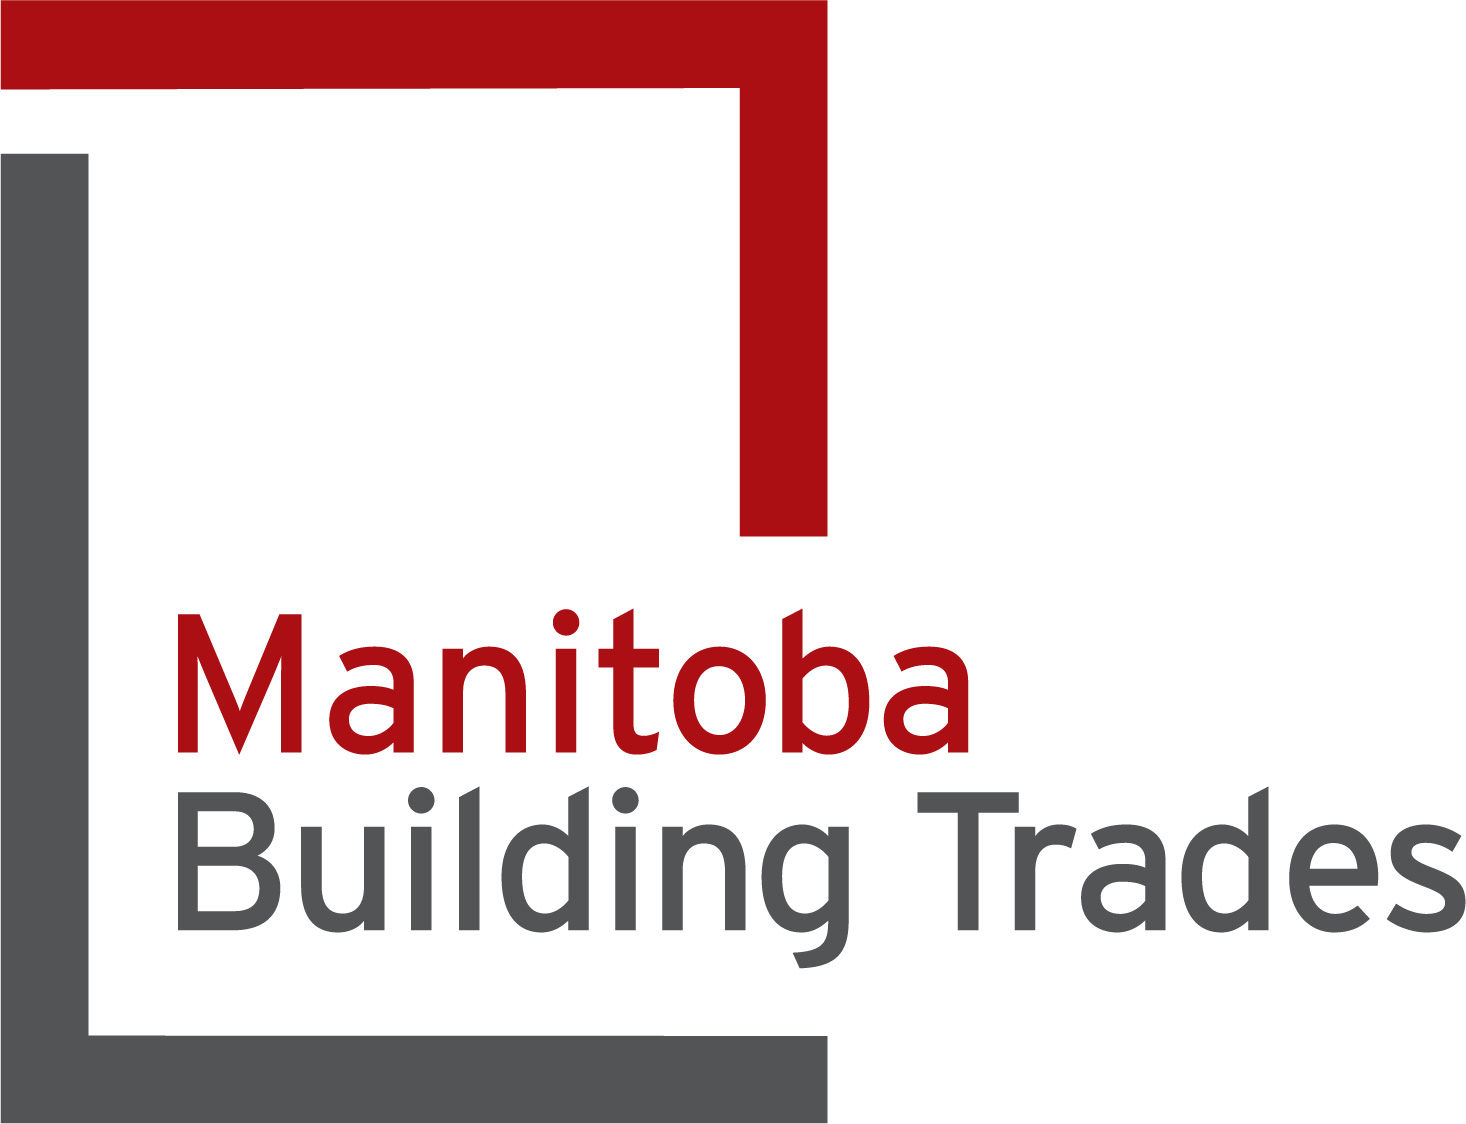 Manitoba Building Trades Logo